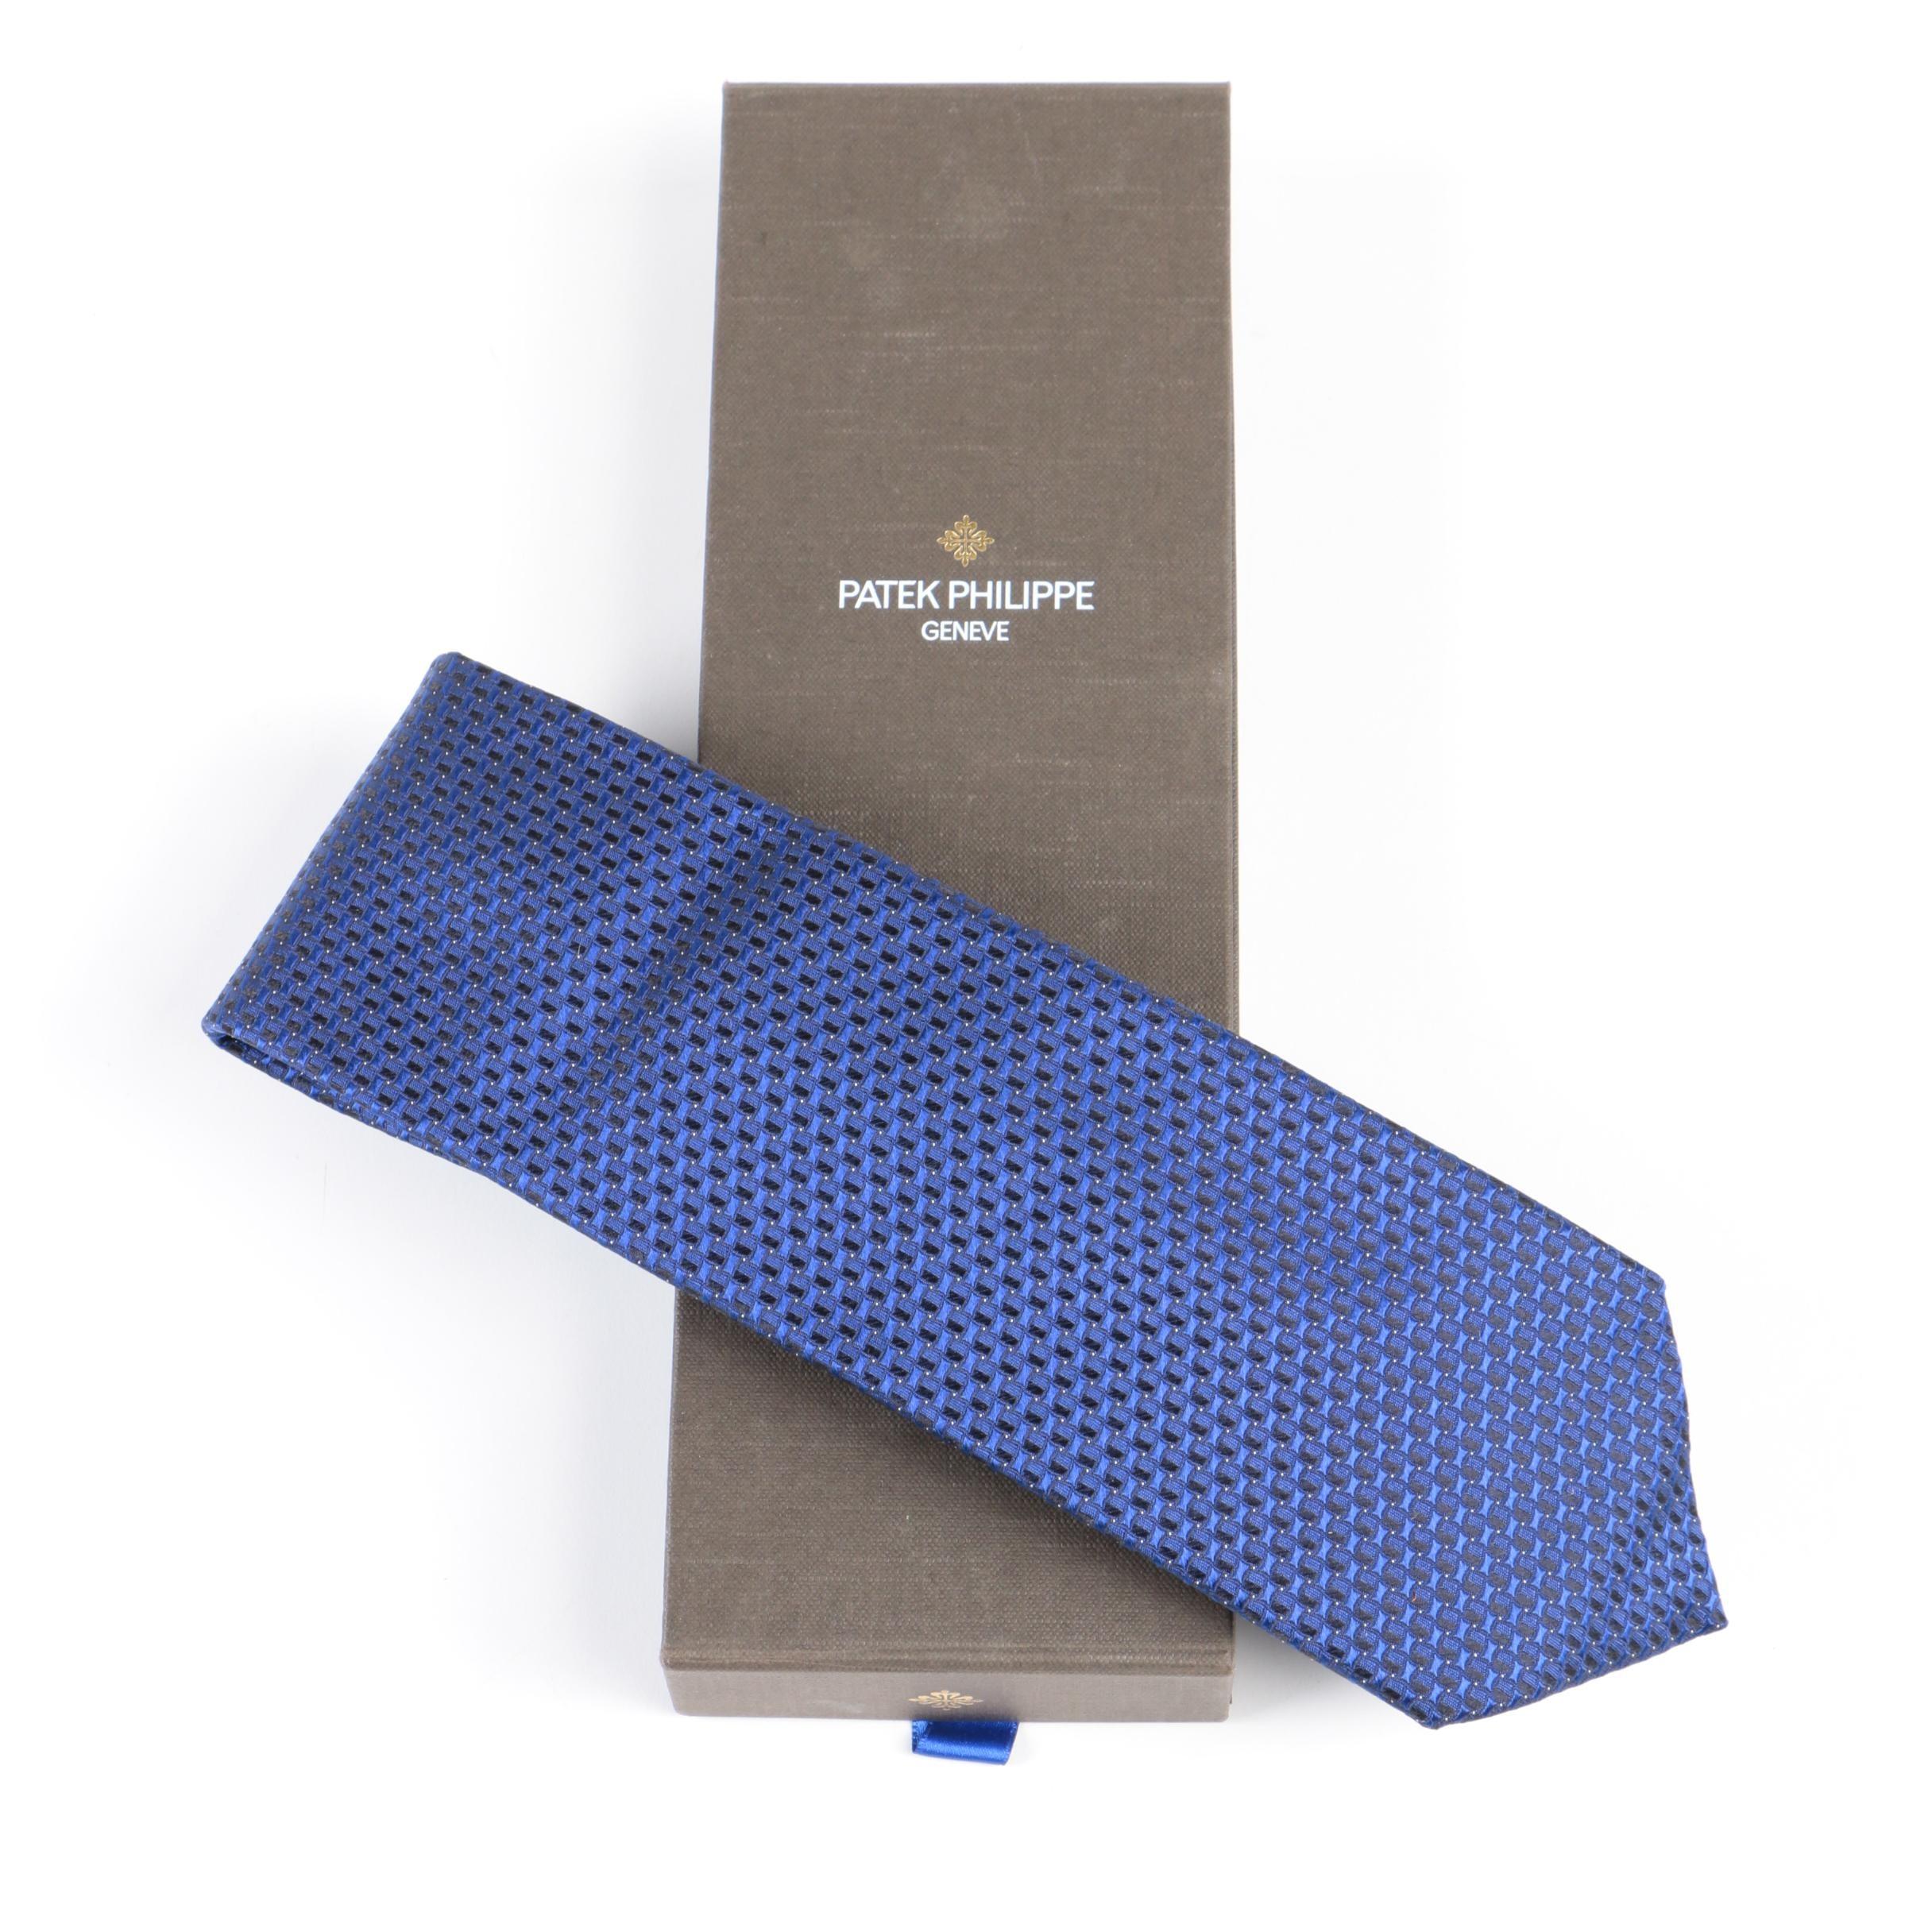 Patek Philippe Geneve Blue Silk Tie